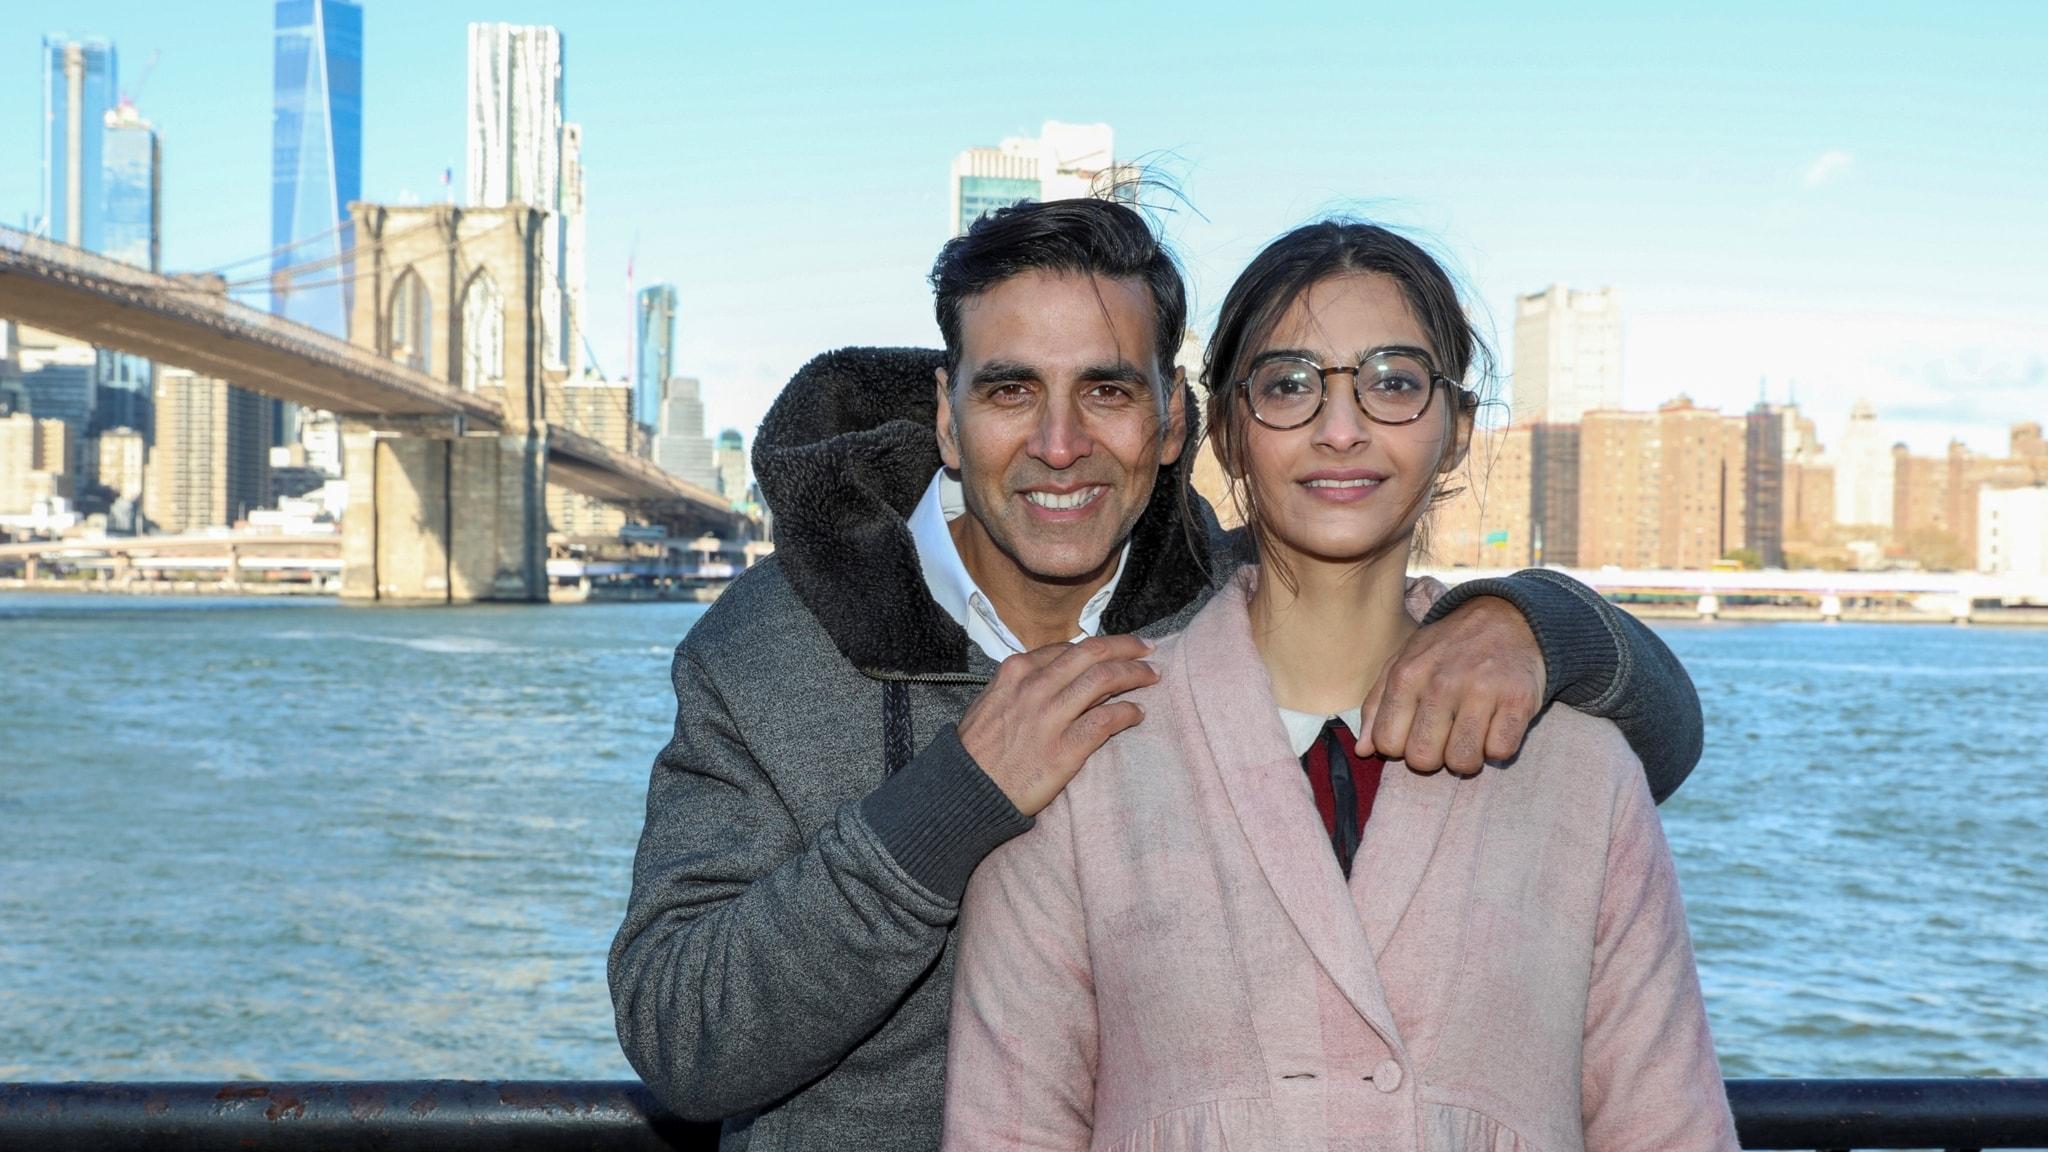 omedelbar dating Delhi vetenskapen bakom dejtingsajter